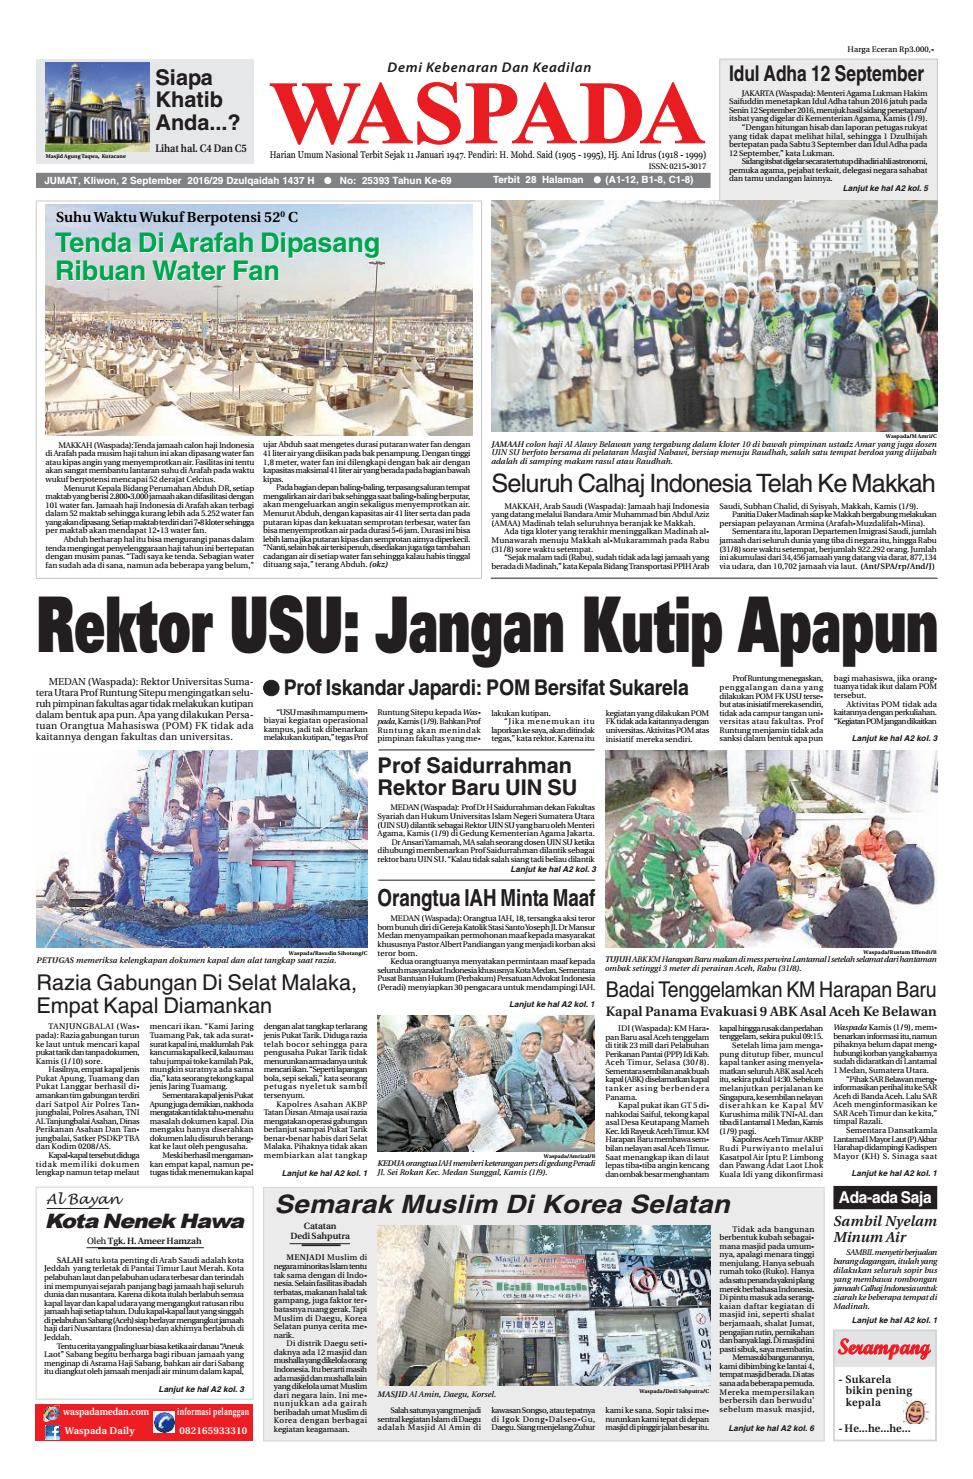 Copy Of Jumat 2 September 2016 By Harian Waspada Issuu